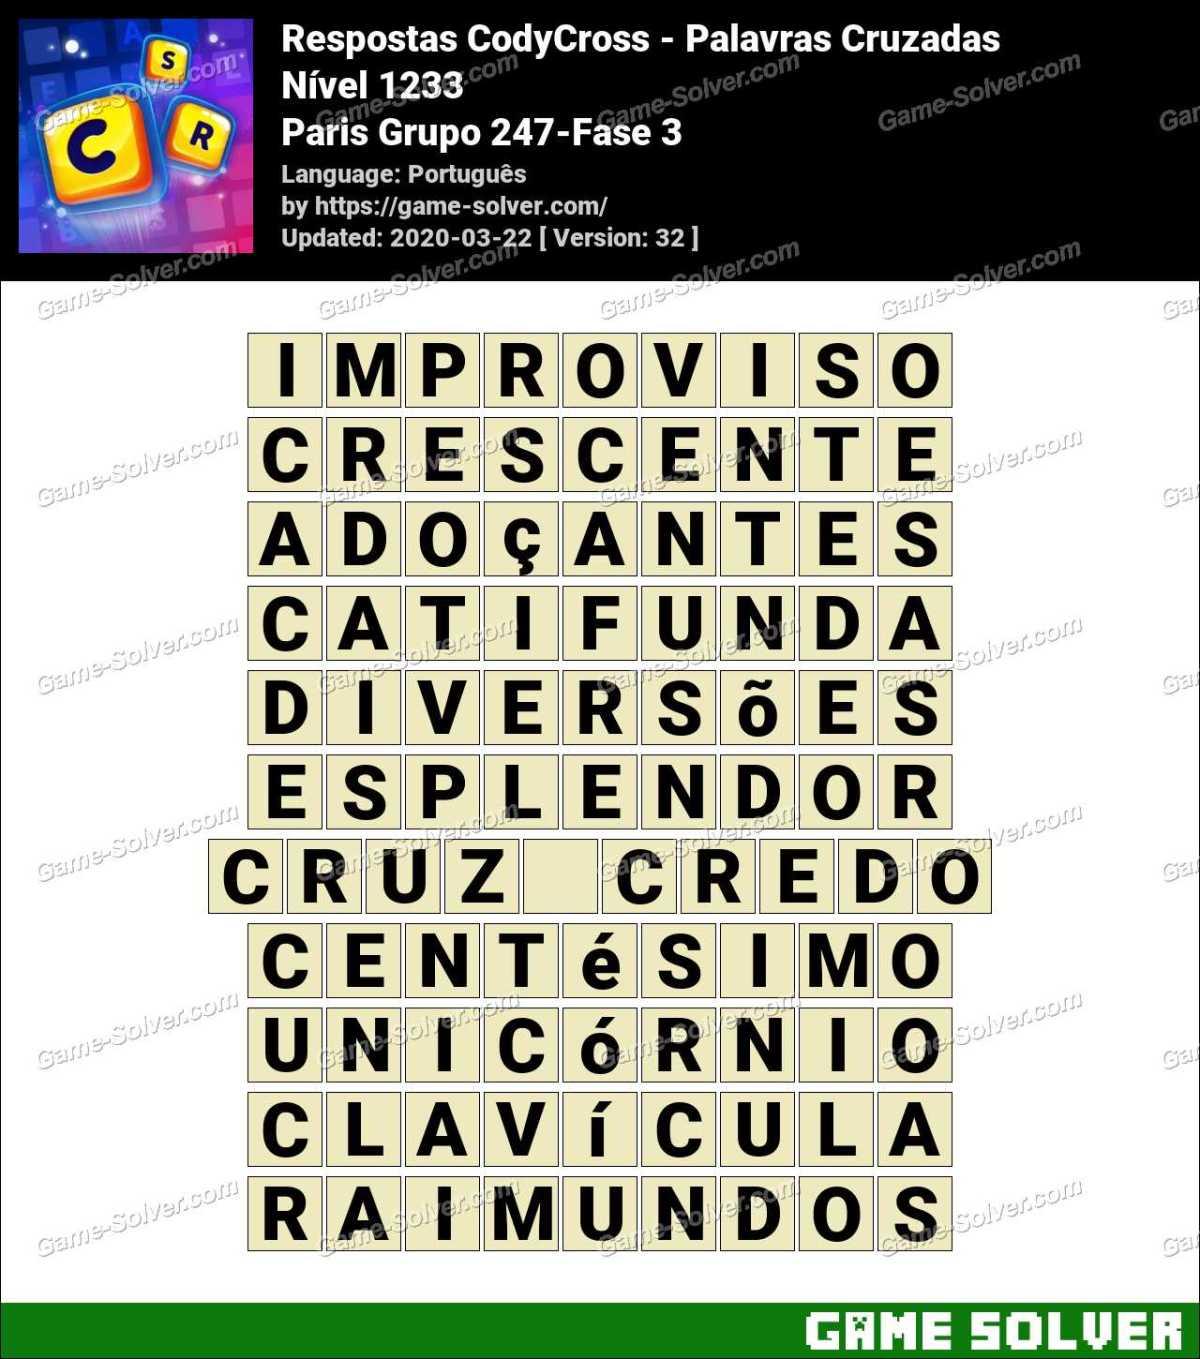 Respostas CodyCross Paris Grupo 247-Fase 3